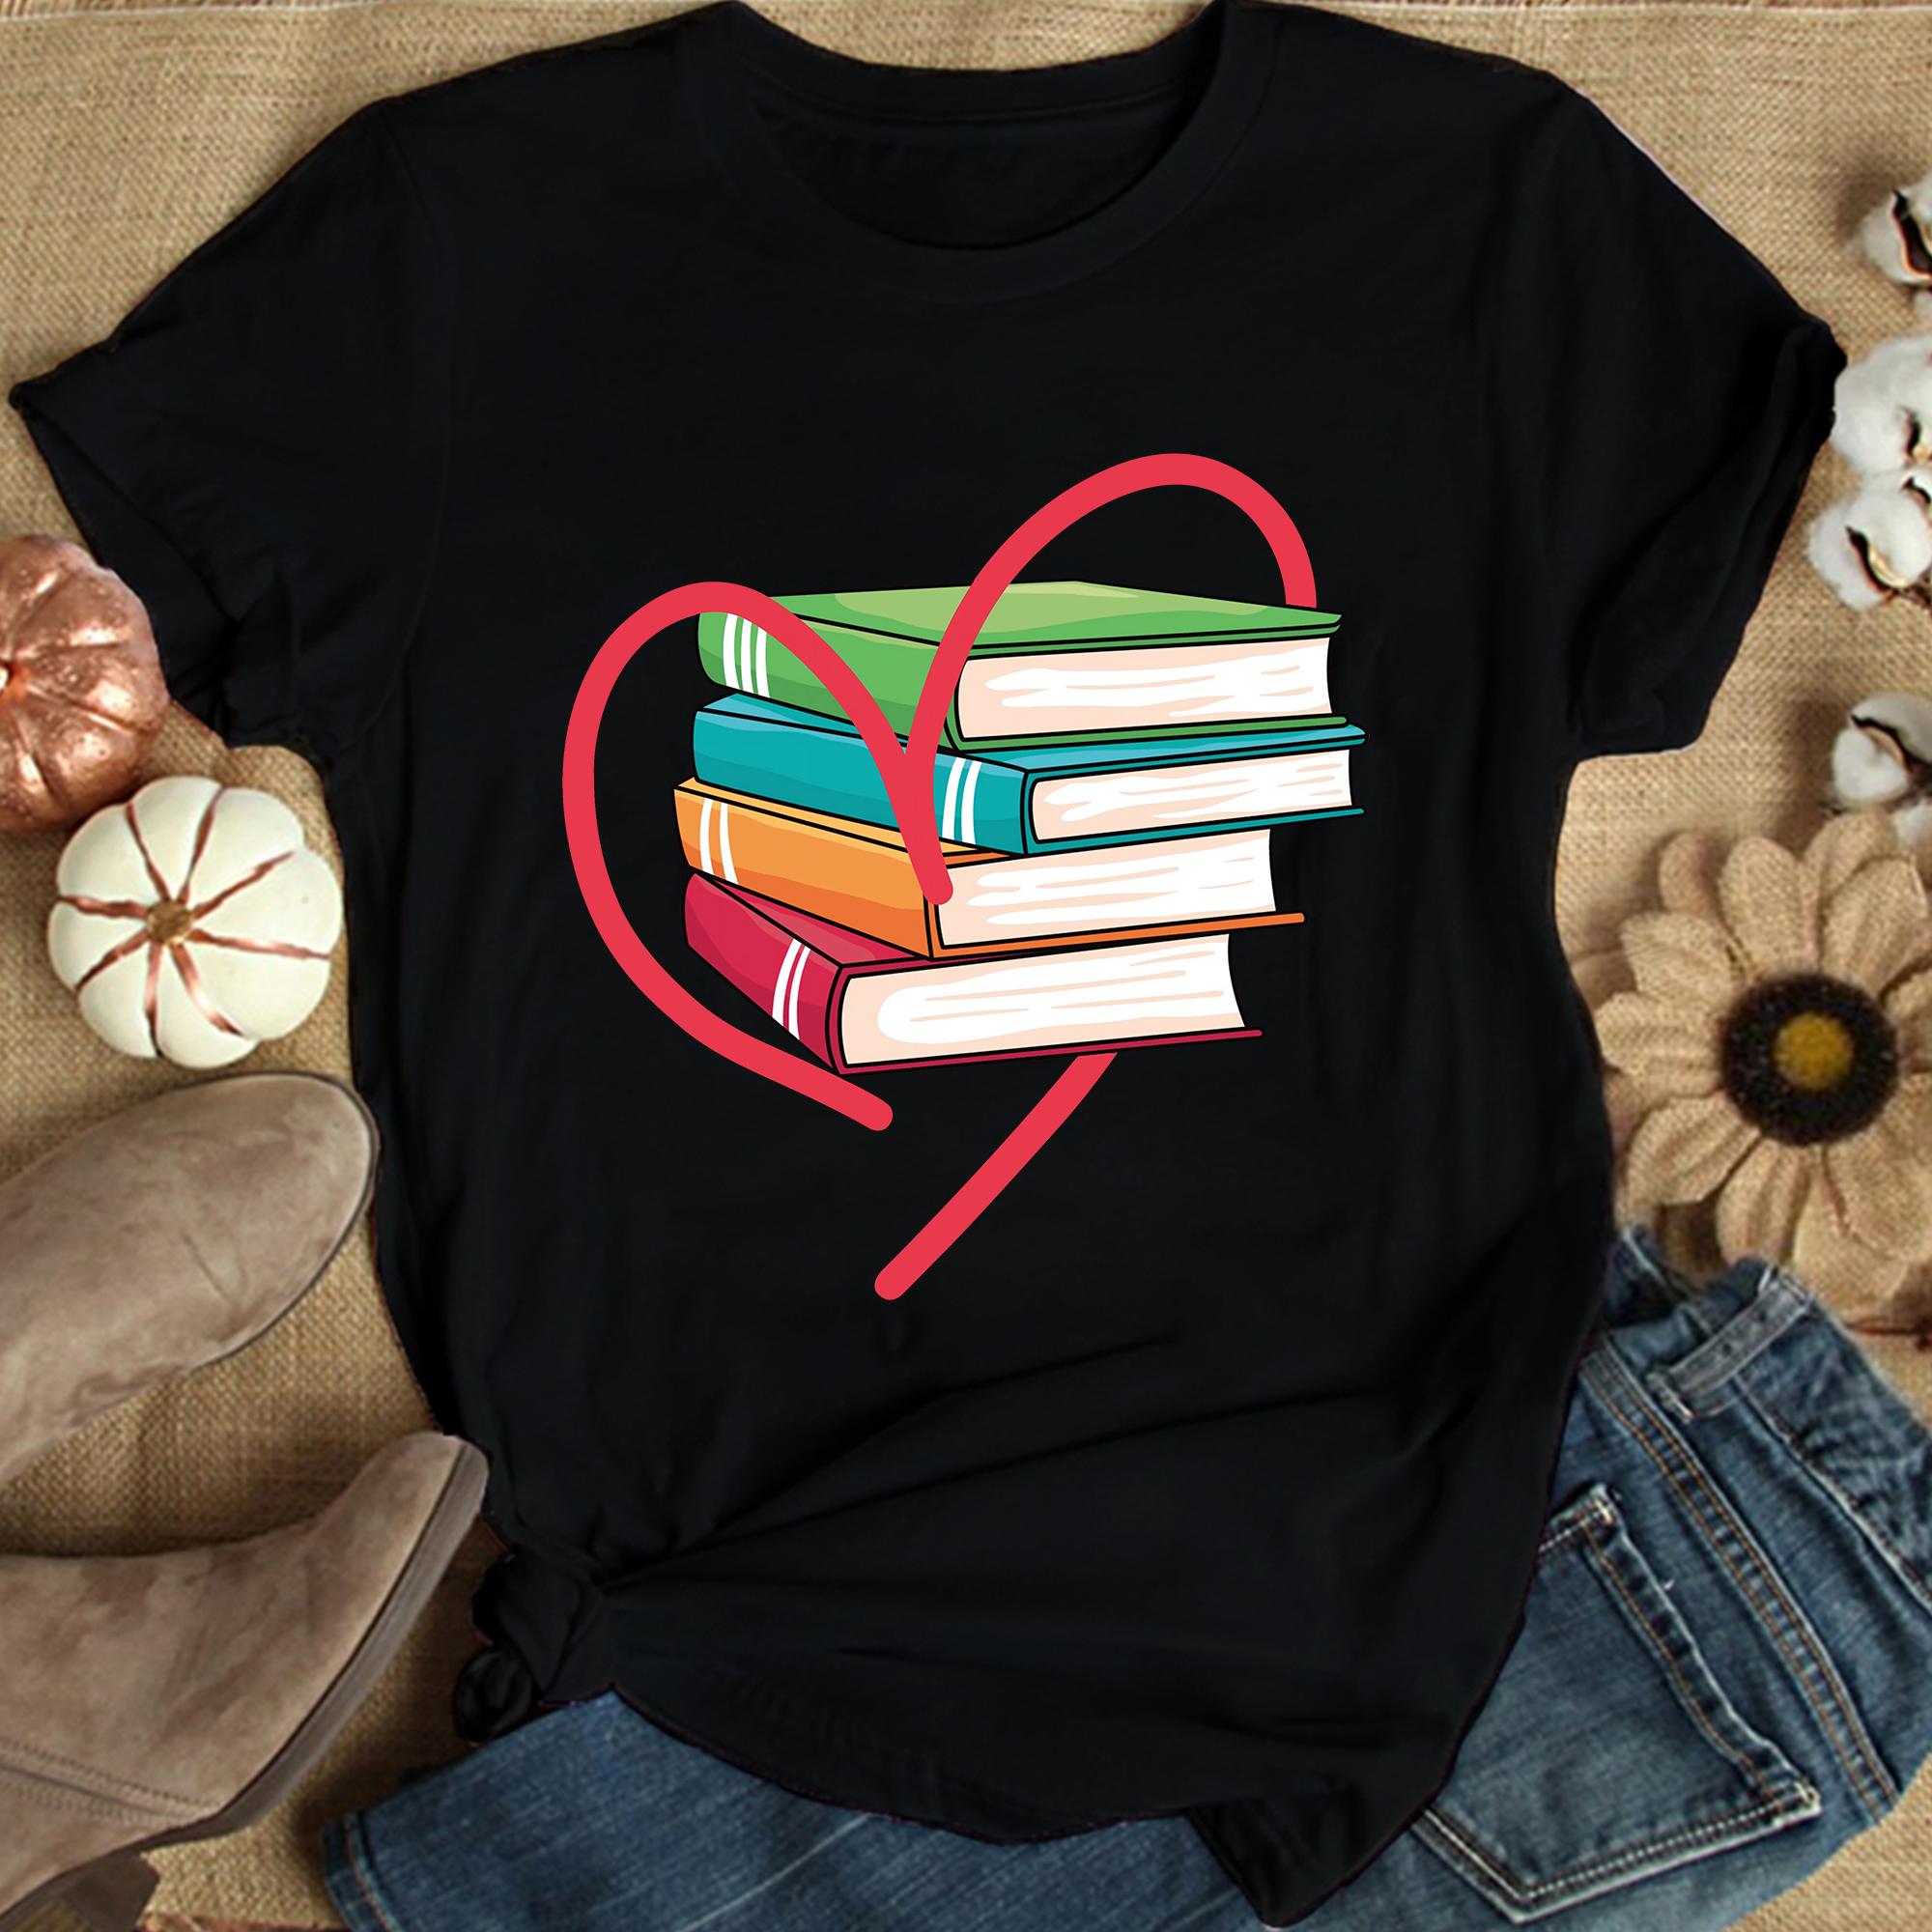 Book Shirt Heart Love Books